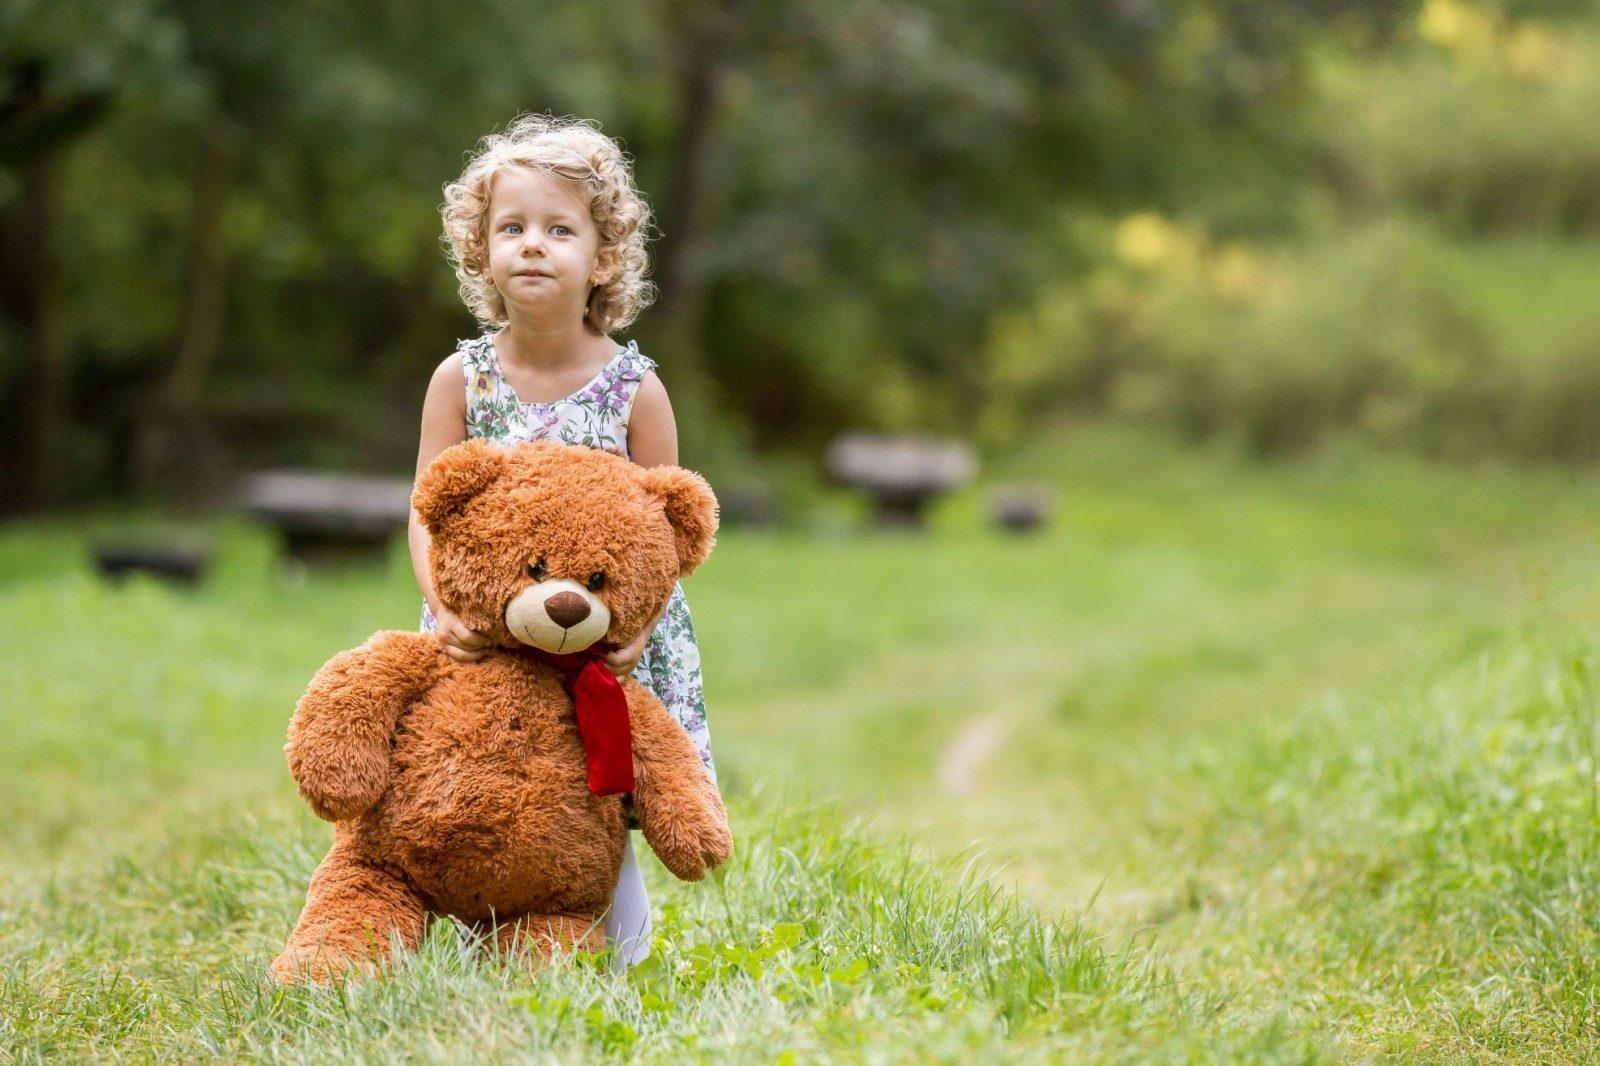 IMG_9739-gyermekfotózás-Veszprém- Balaton-Balatonfüred-Balatonalamádi-Tihany környéke